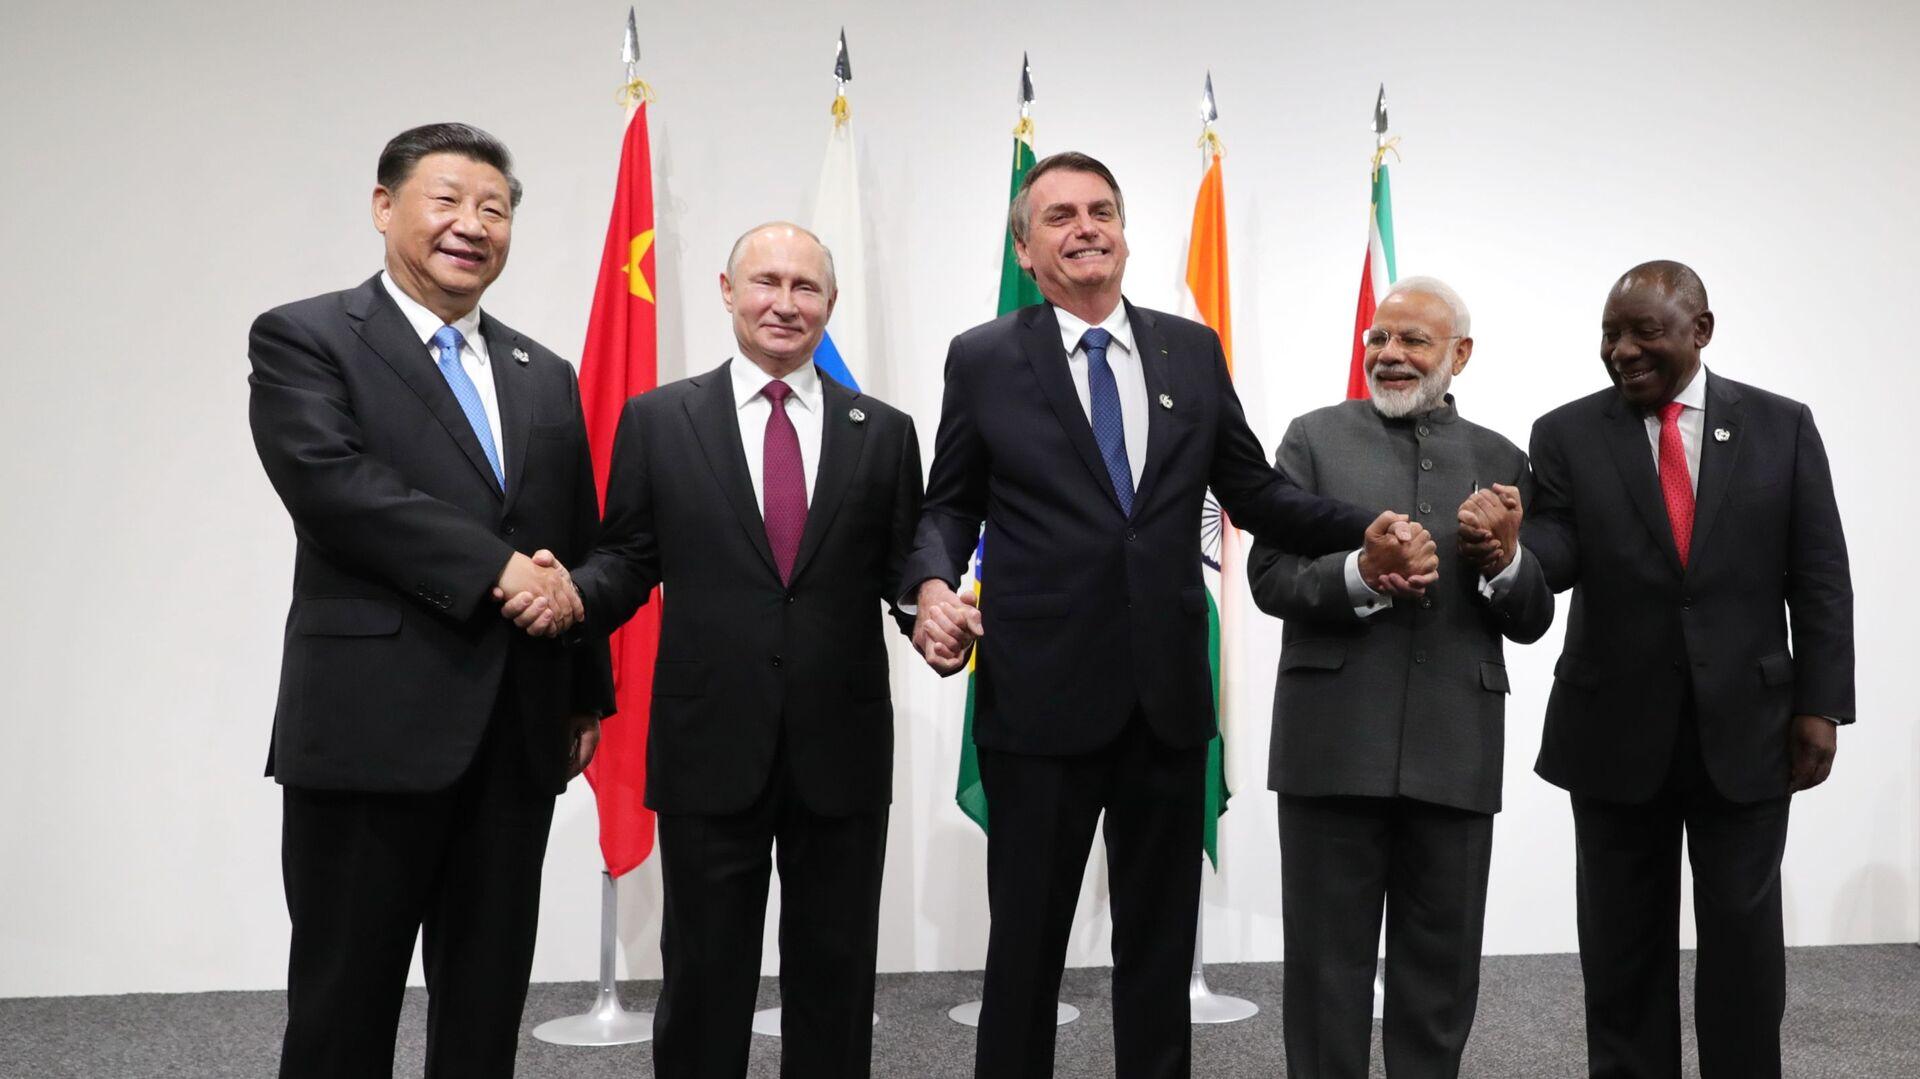 Lideři BRICS - Sputnik Česká republika, 1920, 09.09.2021